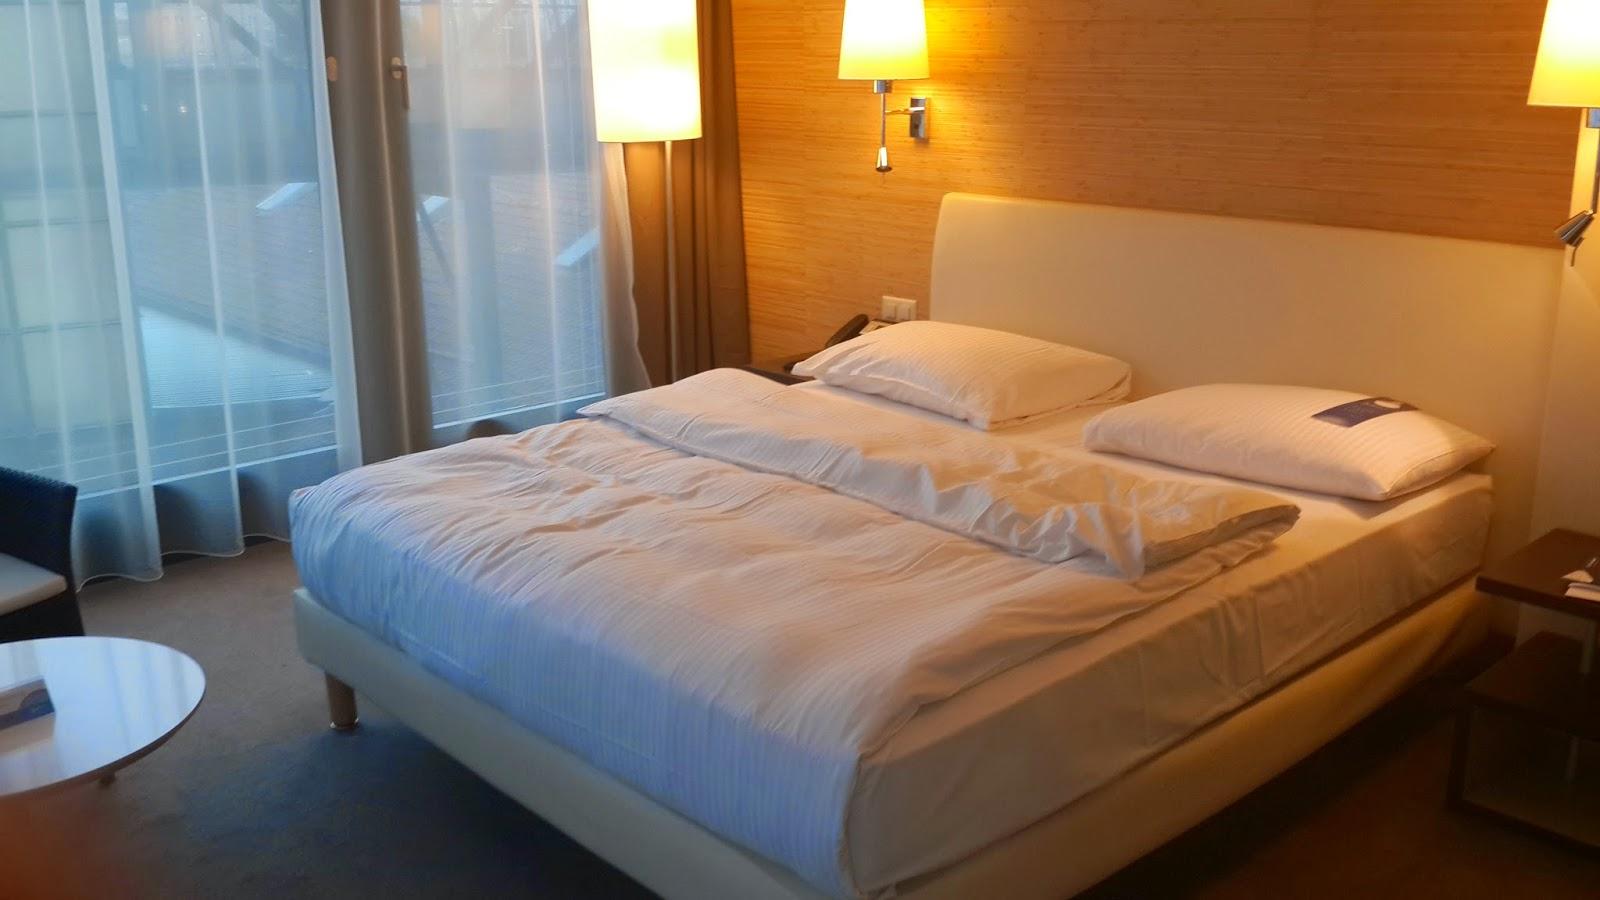 Radisson blu hotel lucerne room rate